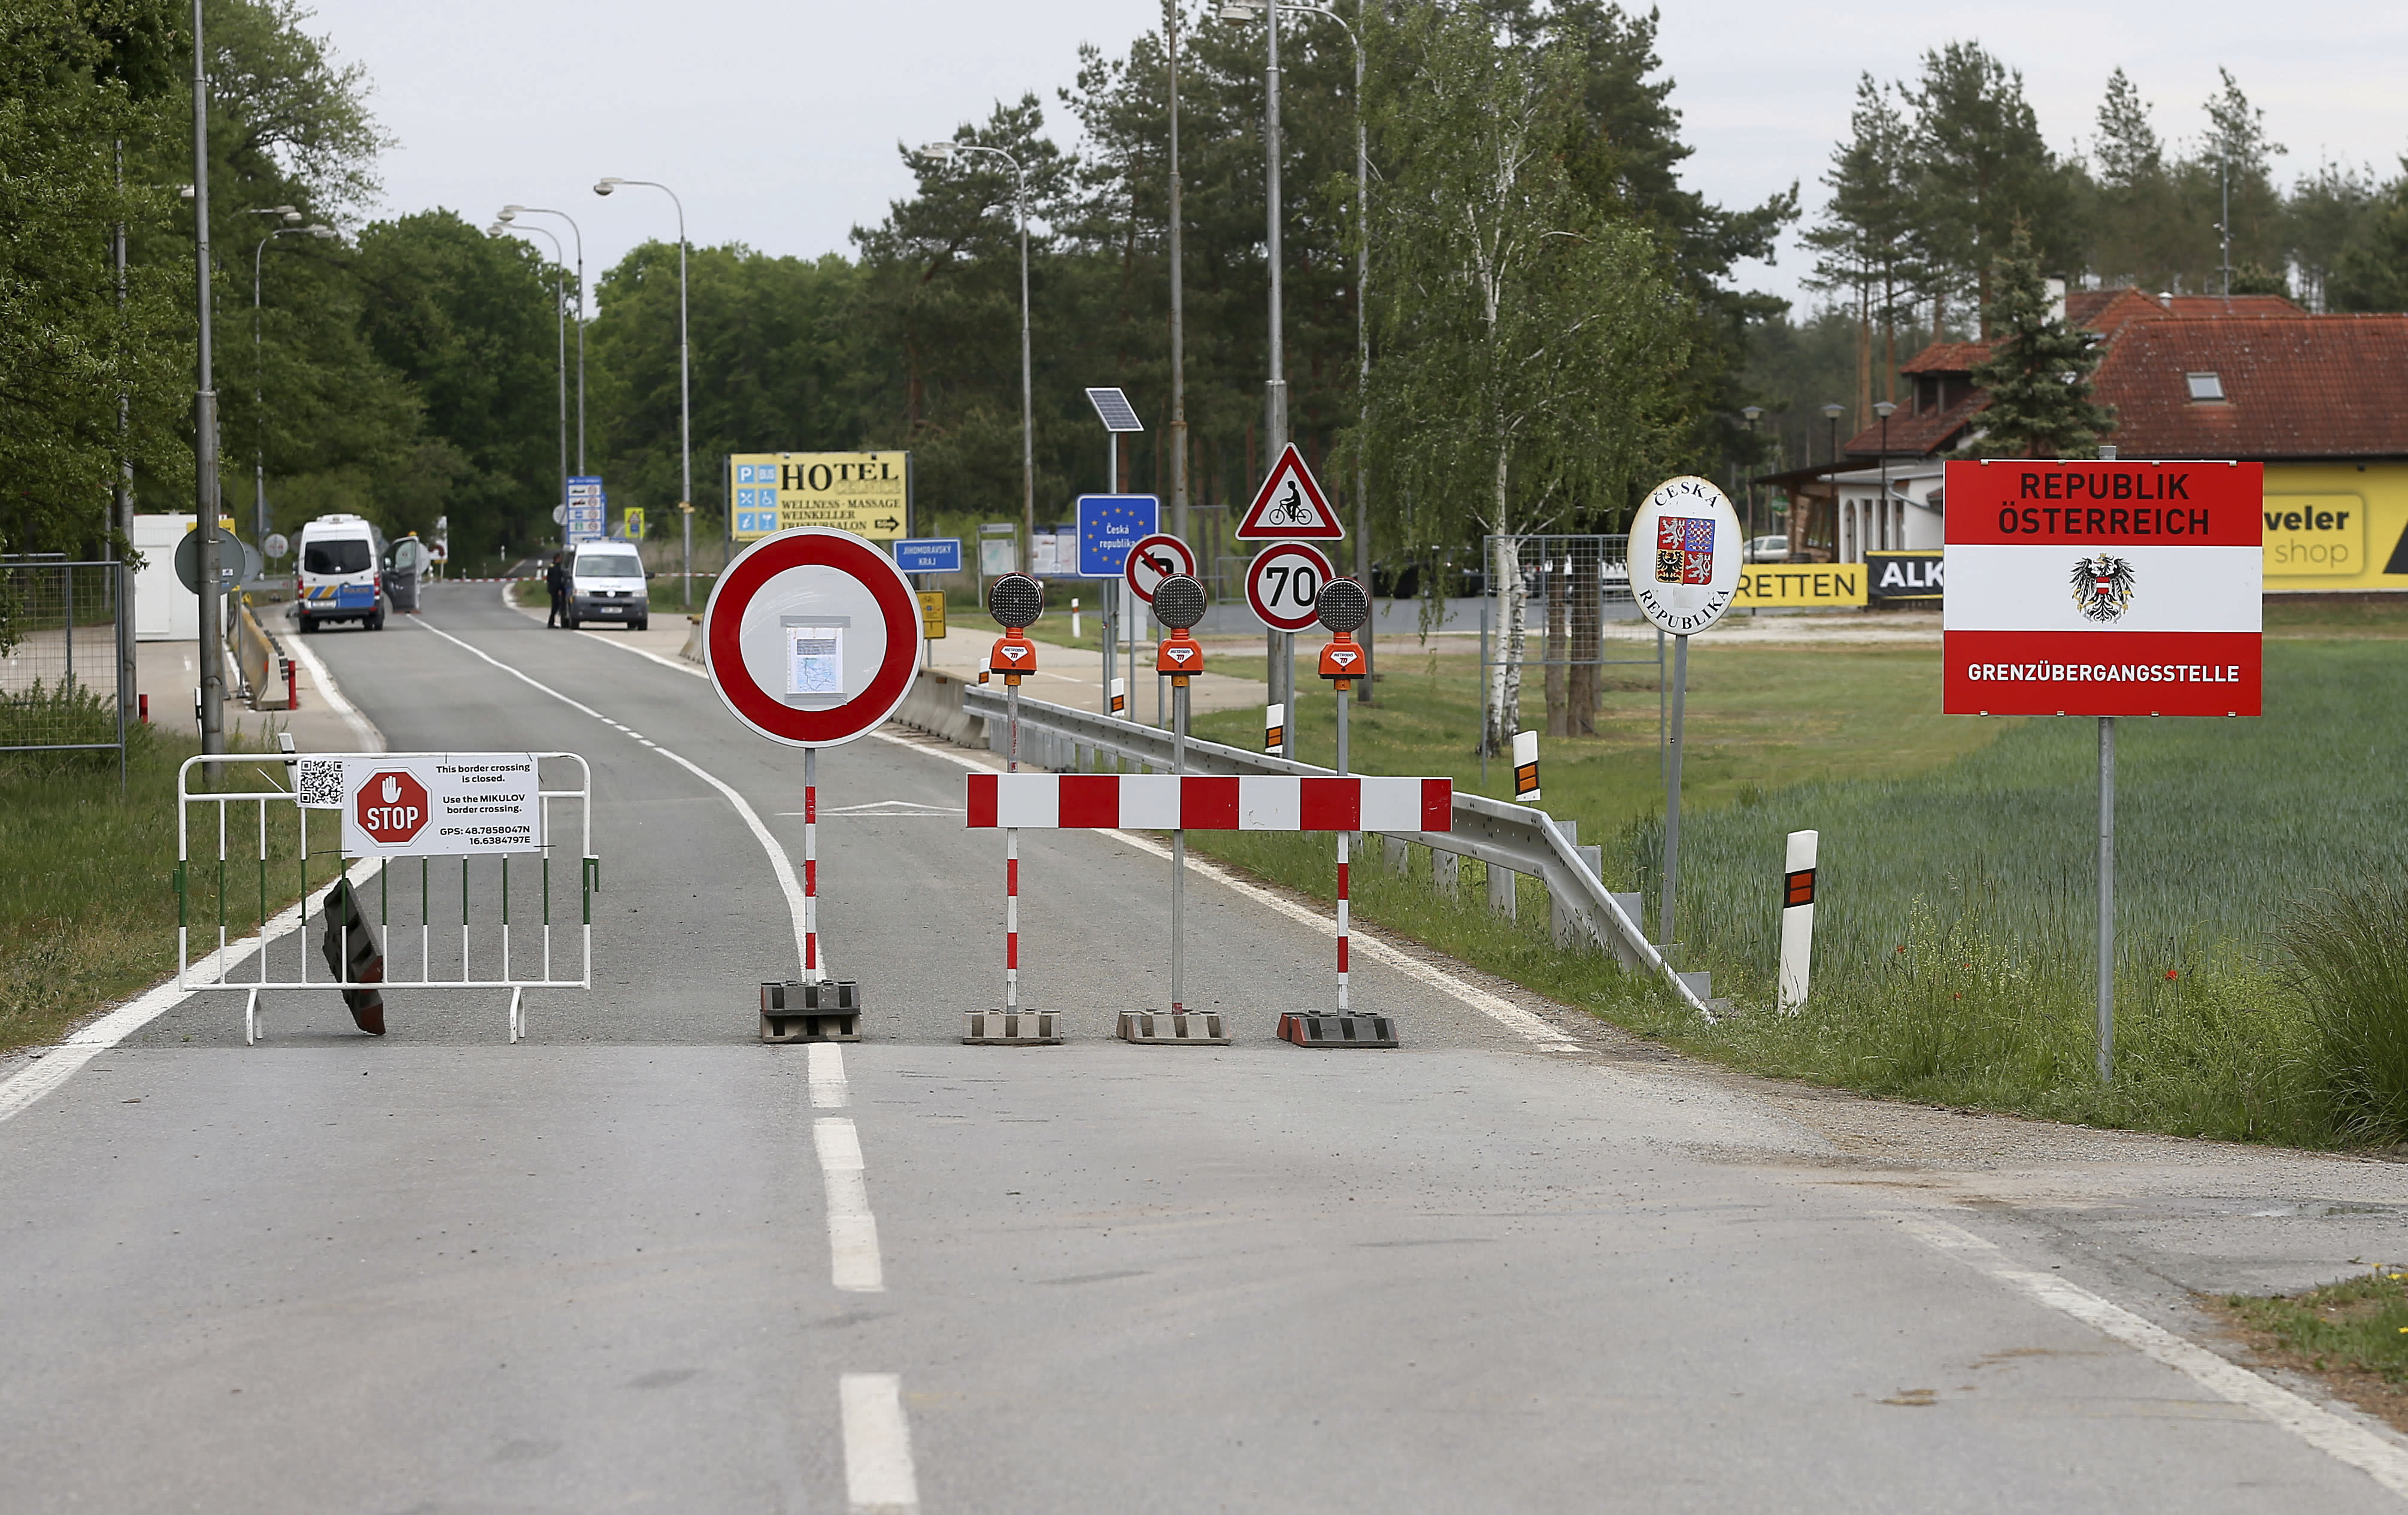 Austria probe points to mistakes in early virus response